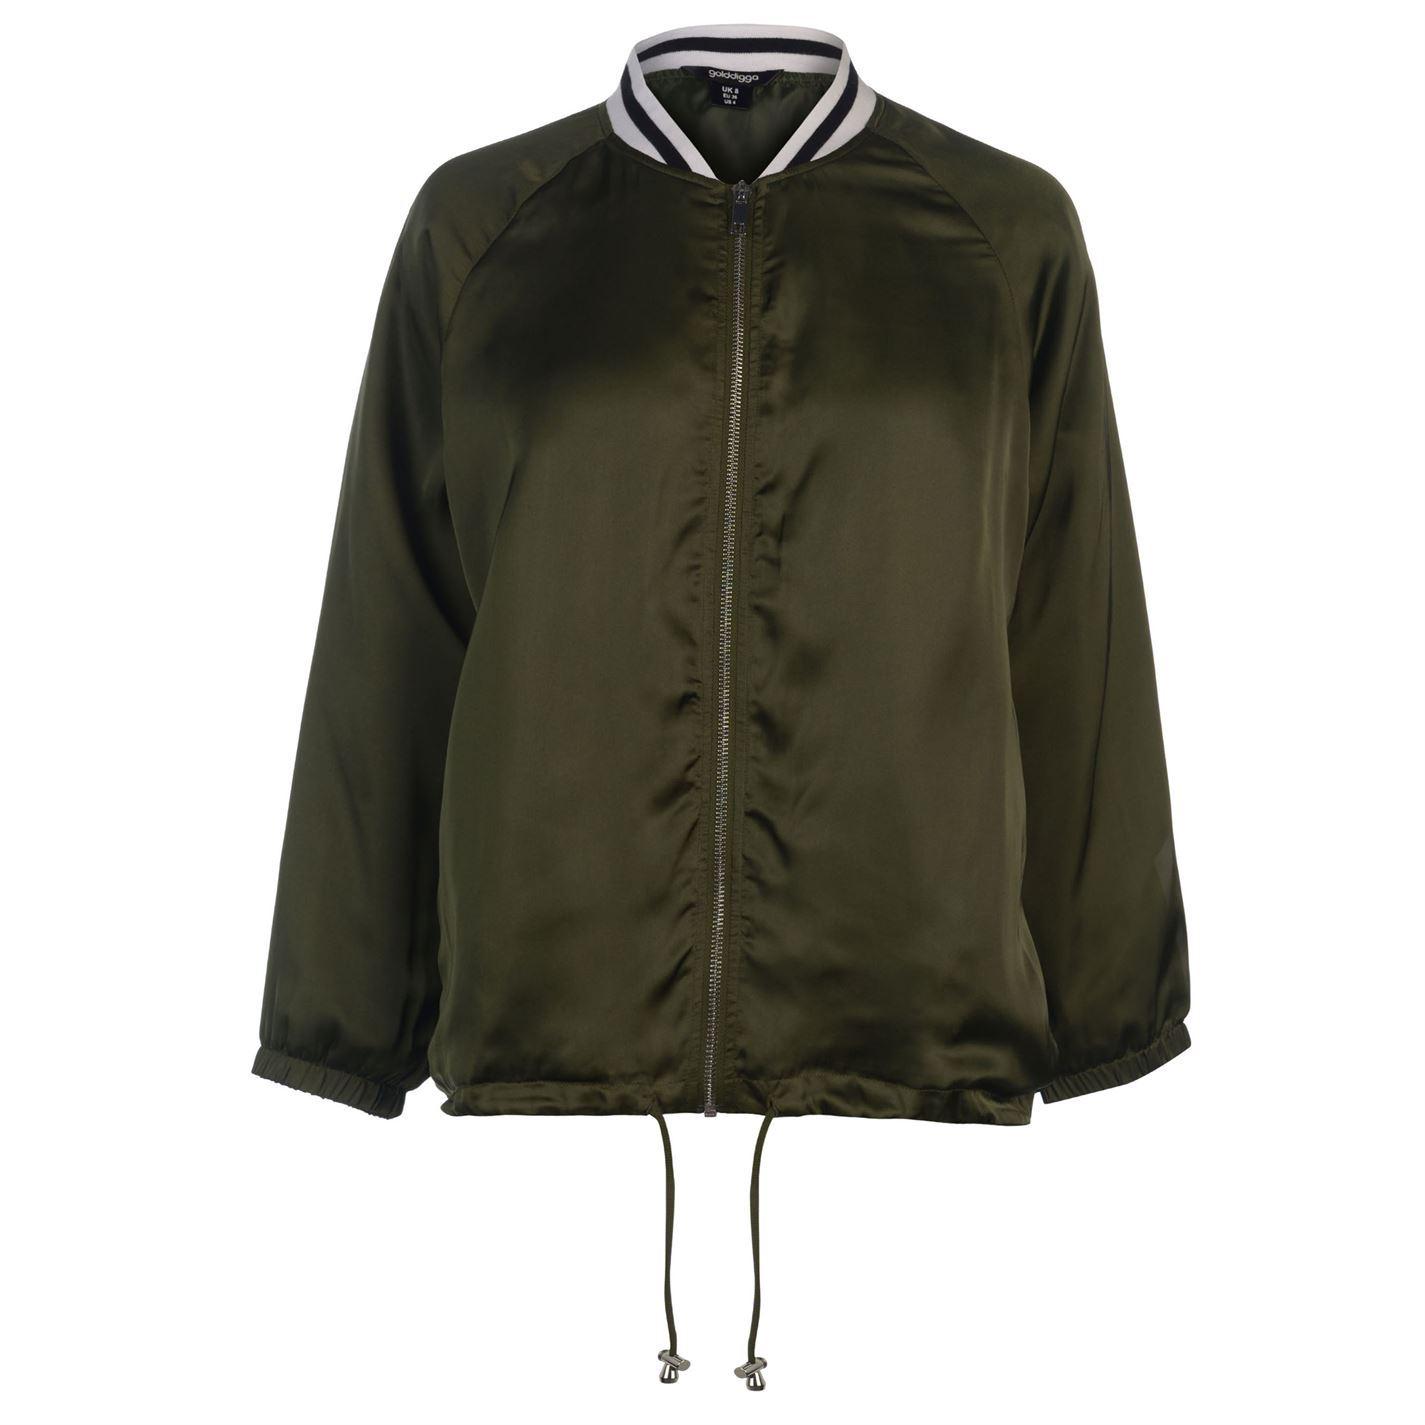 Golddigga-Bomber-Jacket-Womens-Coats-Outerwear thumbnail 6